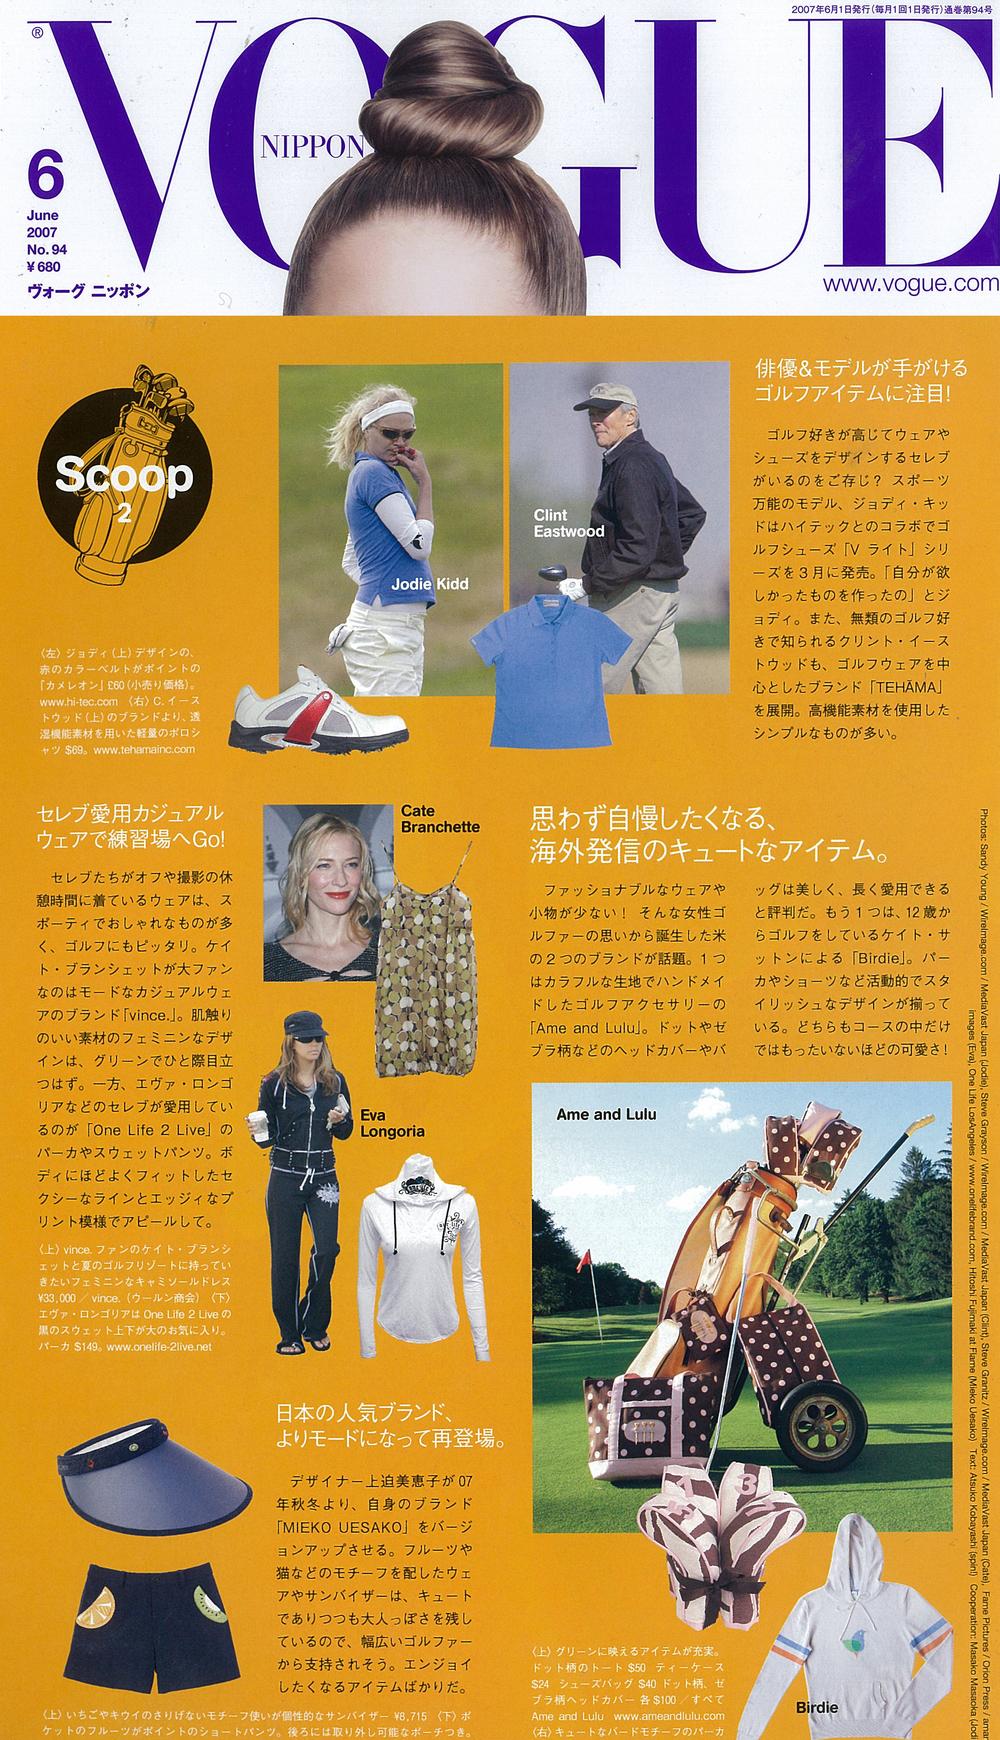 Vogue Japan.jpg